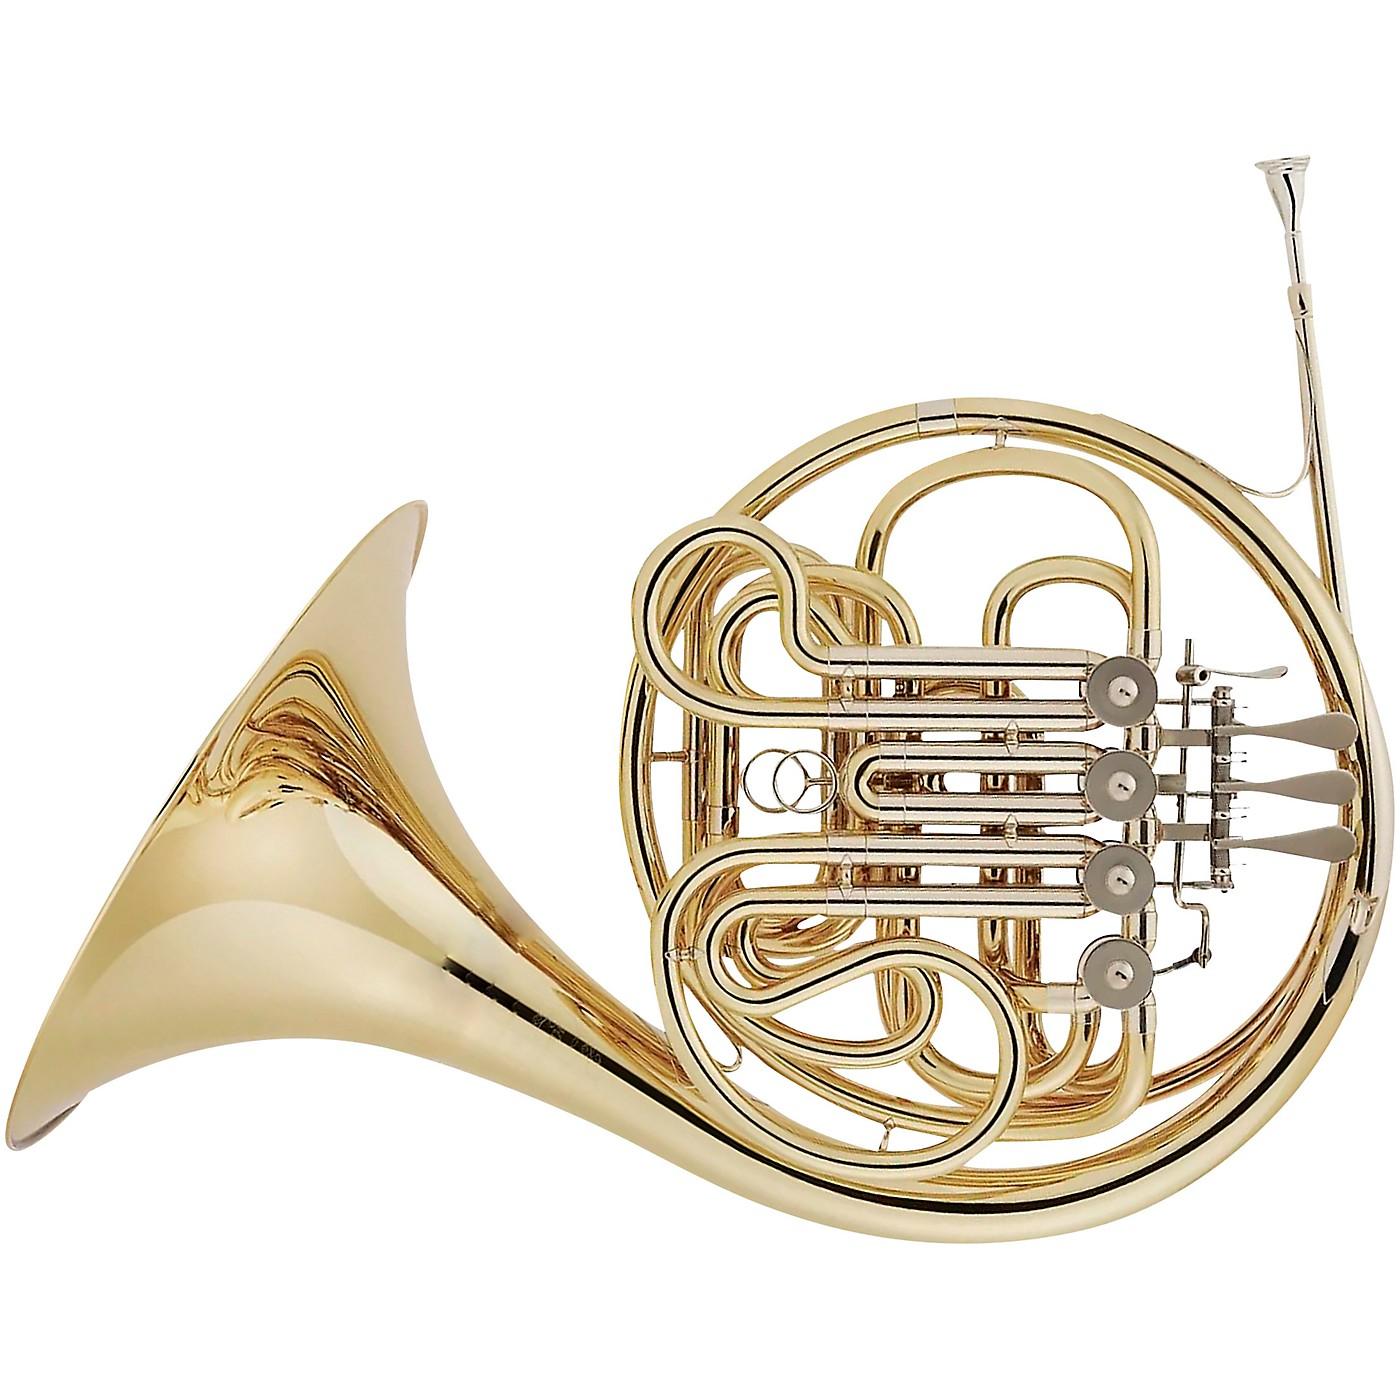 Hans Hoyer 802 Geyer Series Double Horn thumbnail